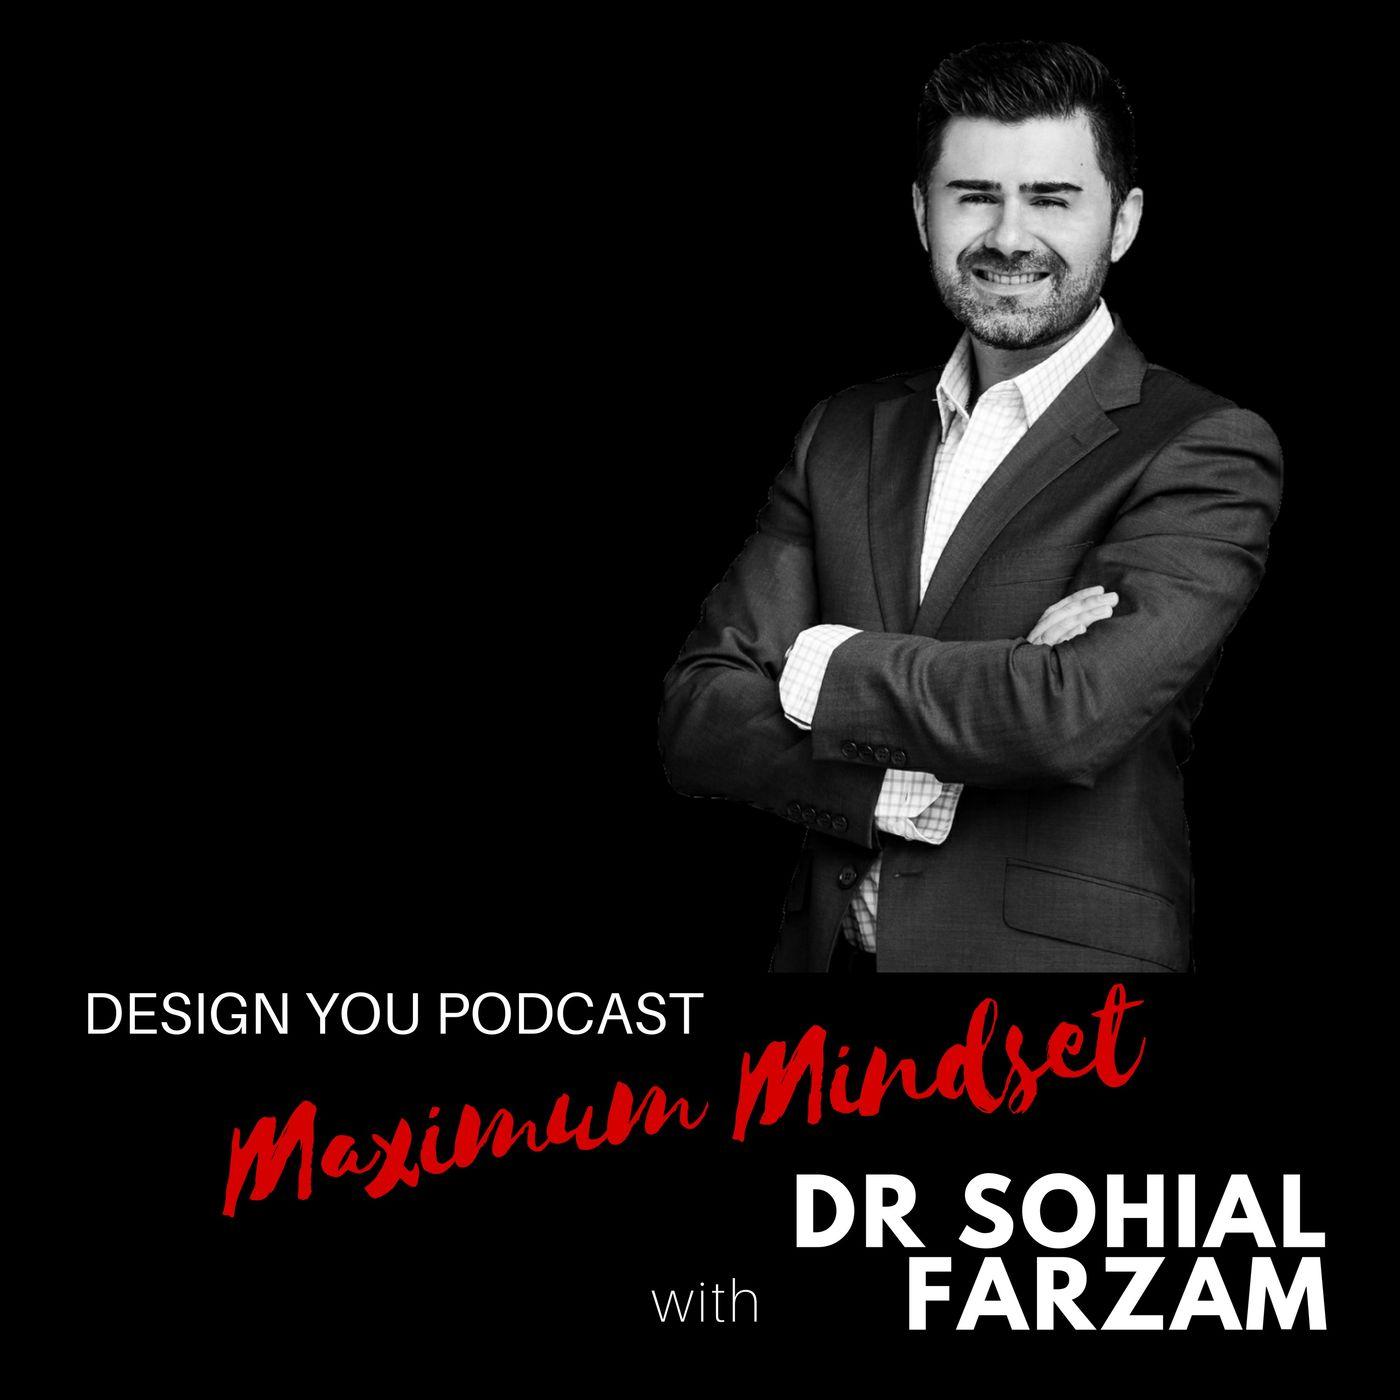 EP 052 – Maximum Mindset with Dr Sohial Farzem